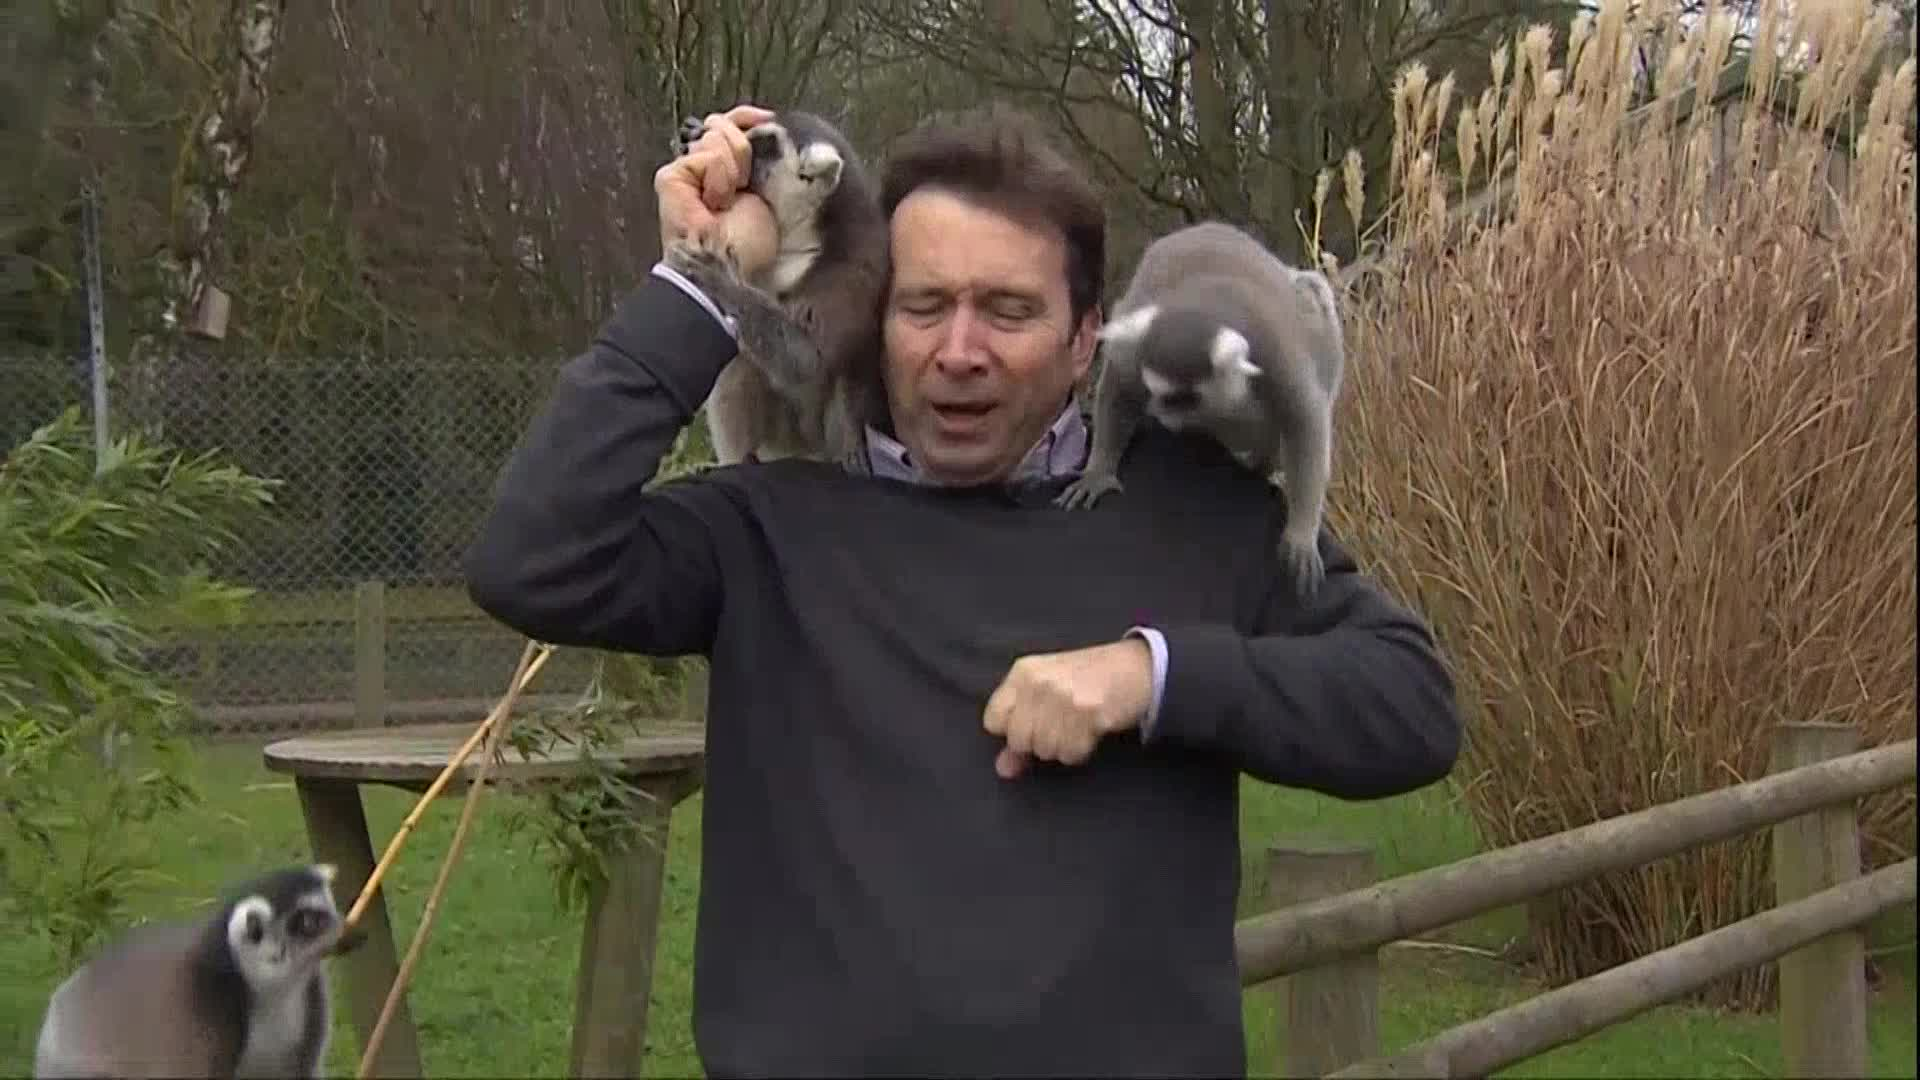 lemurs BBC reporter_612837